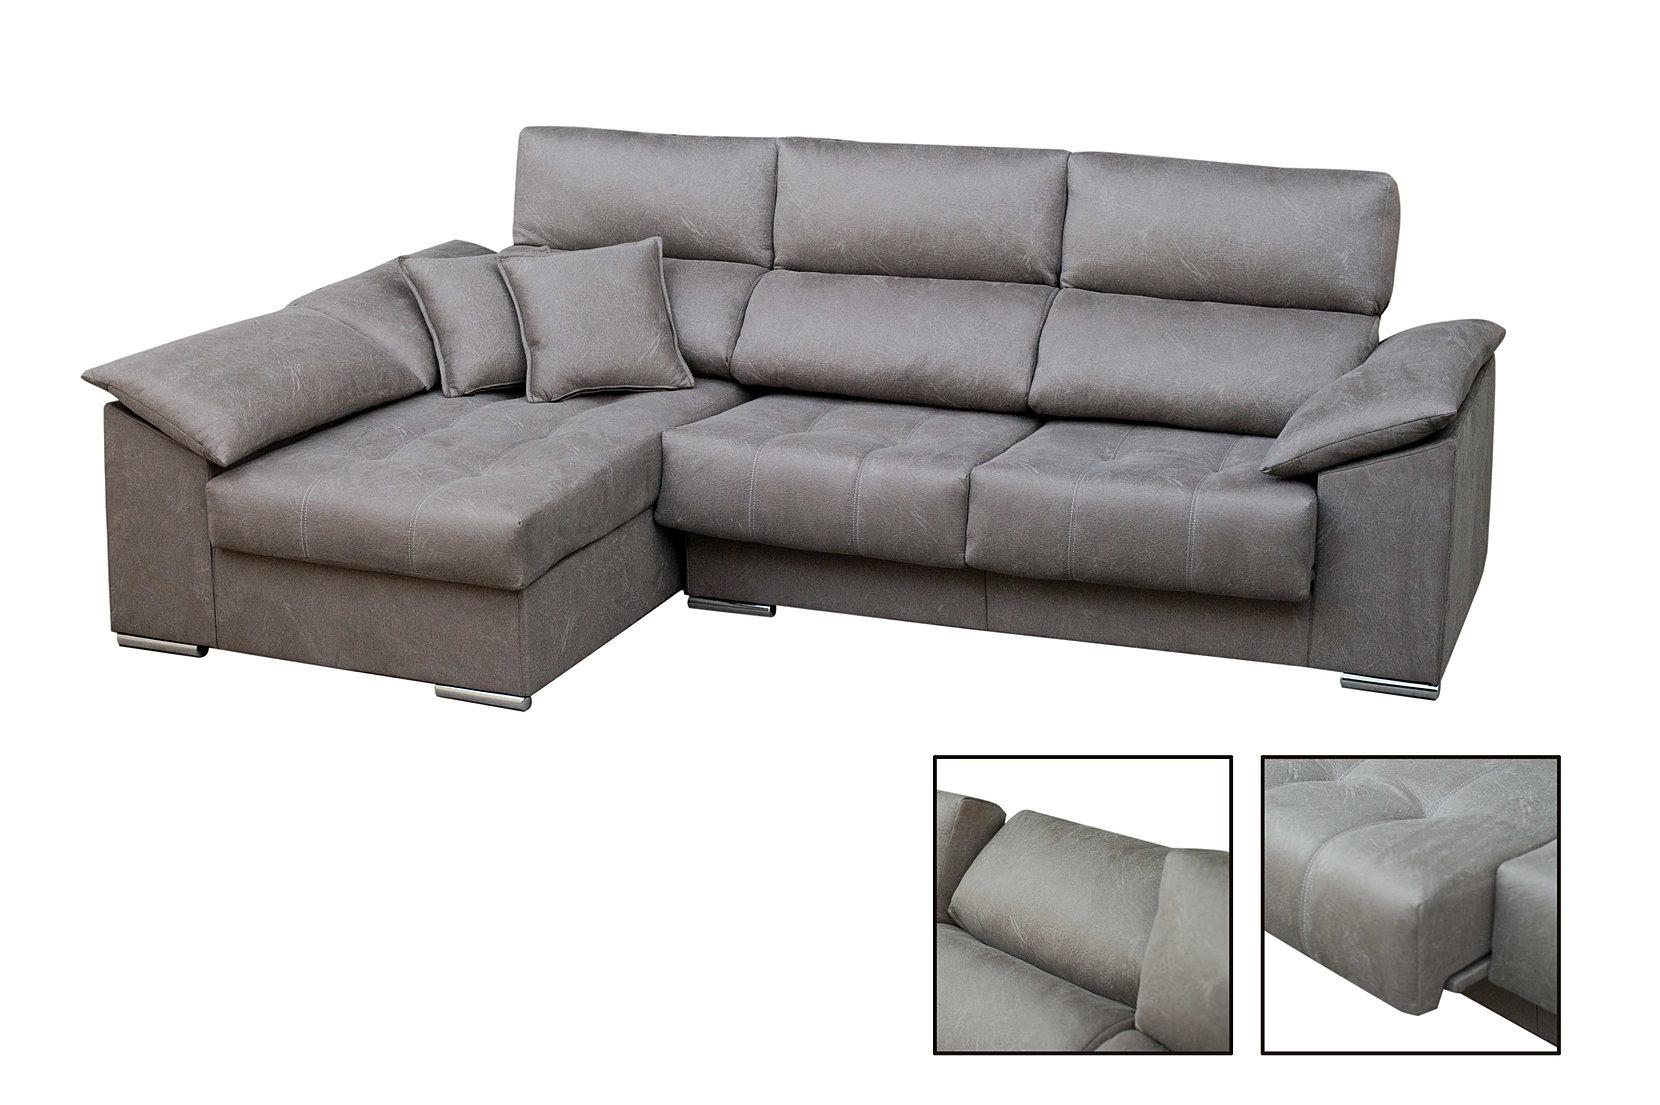 Liquisof s sof s chaiselongues baratos en m laga - Sofas en marbella ...